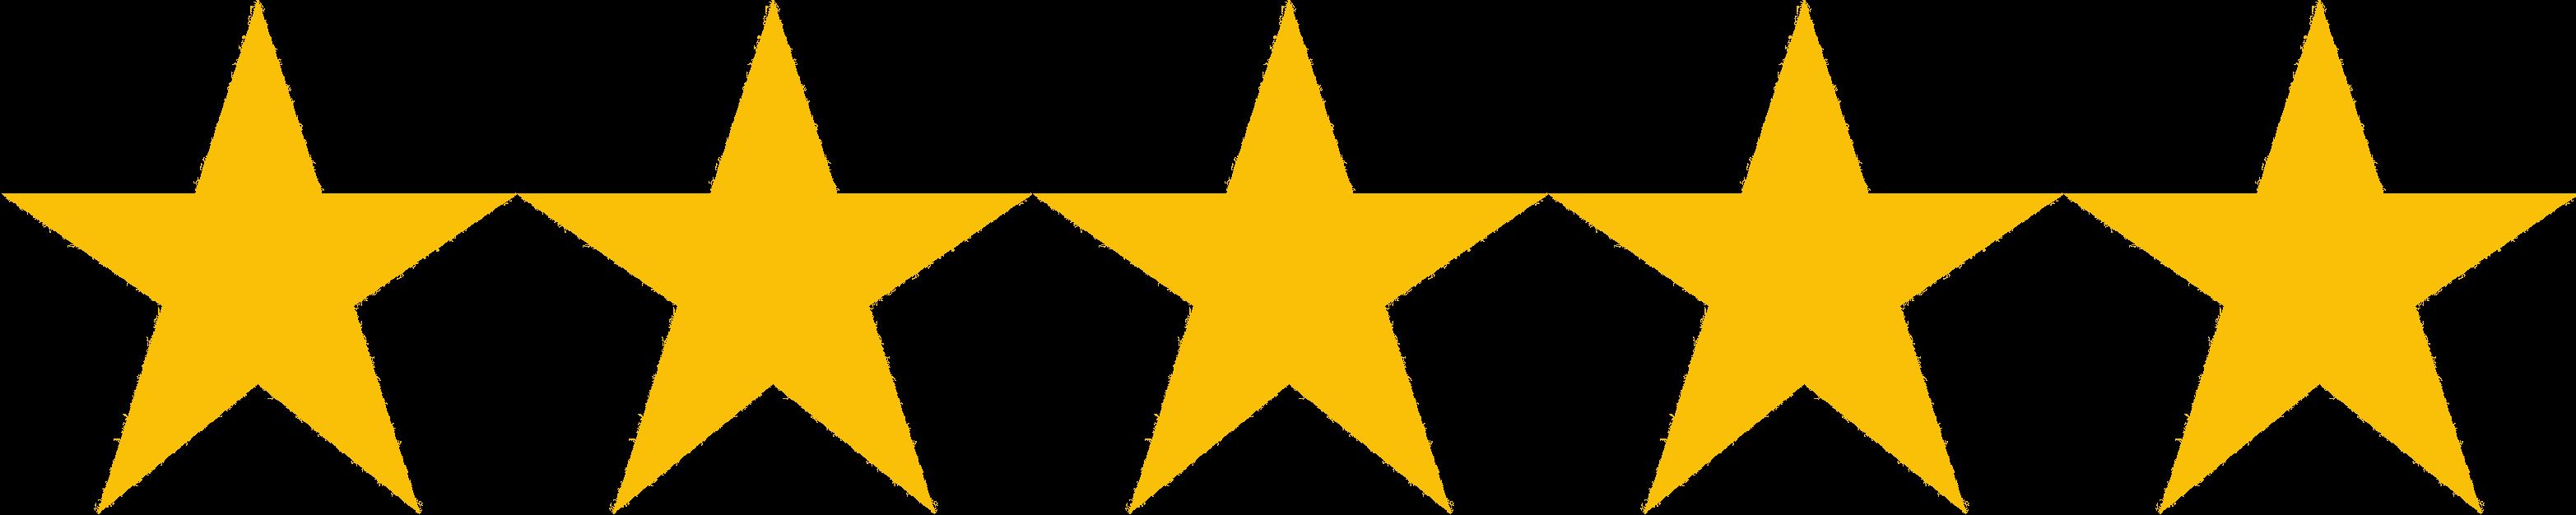 Resultado de imagem para 5 estrelas ICON PNG